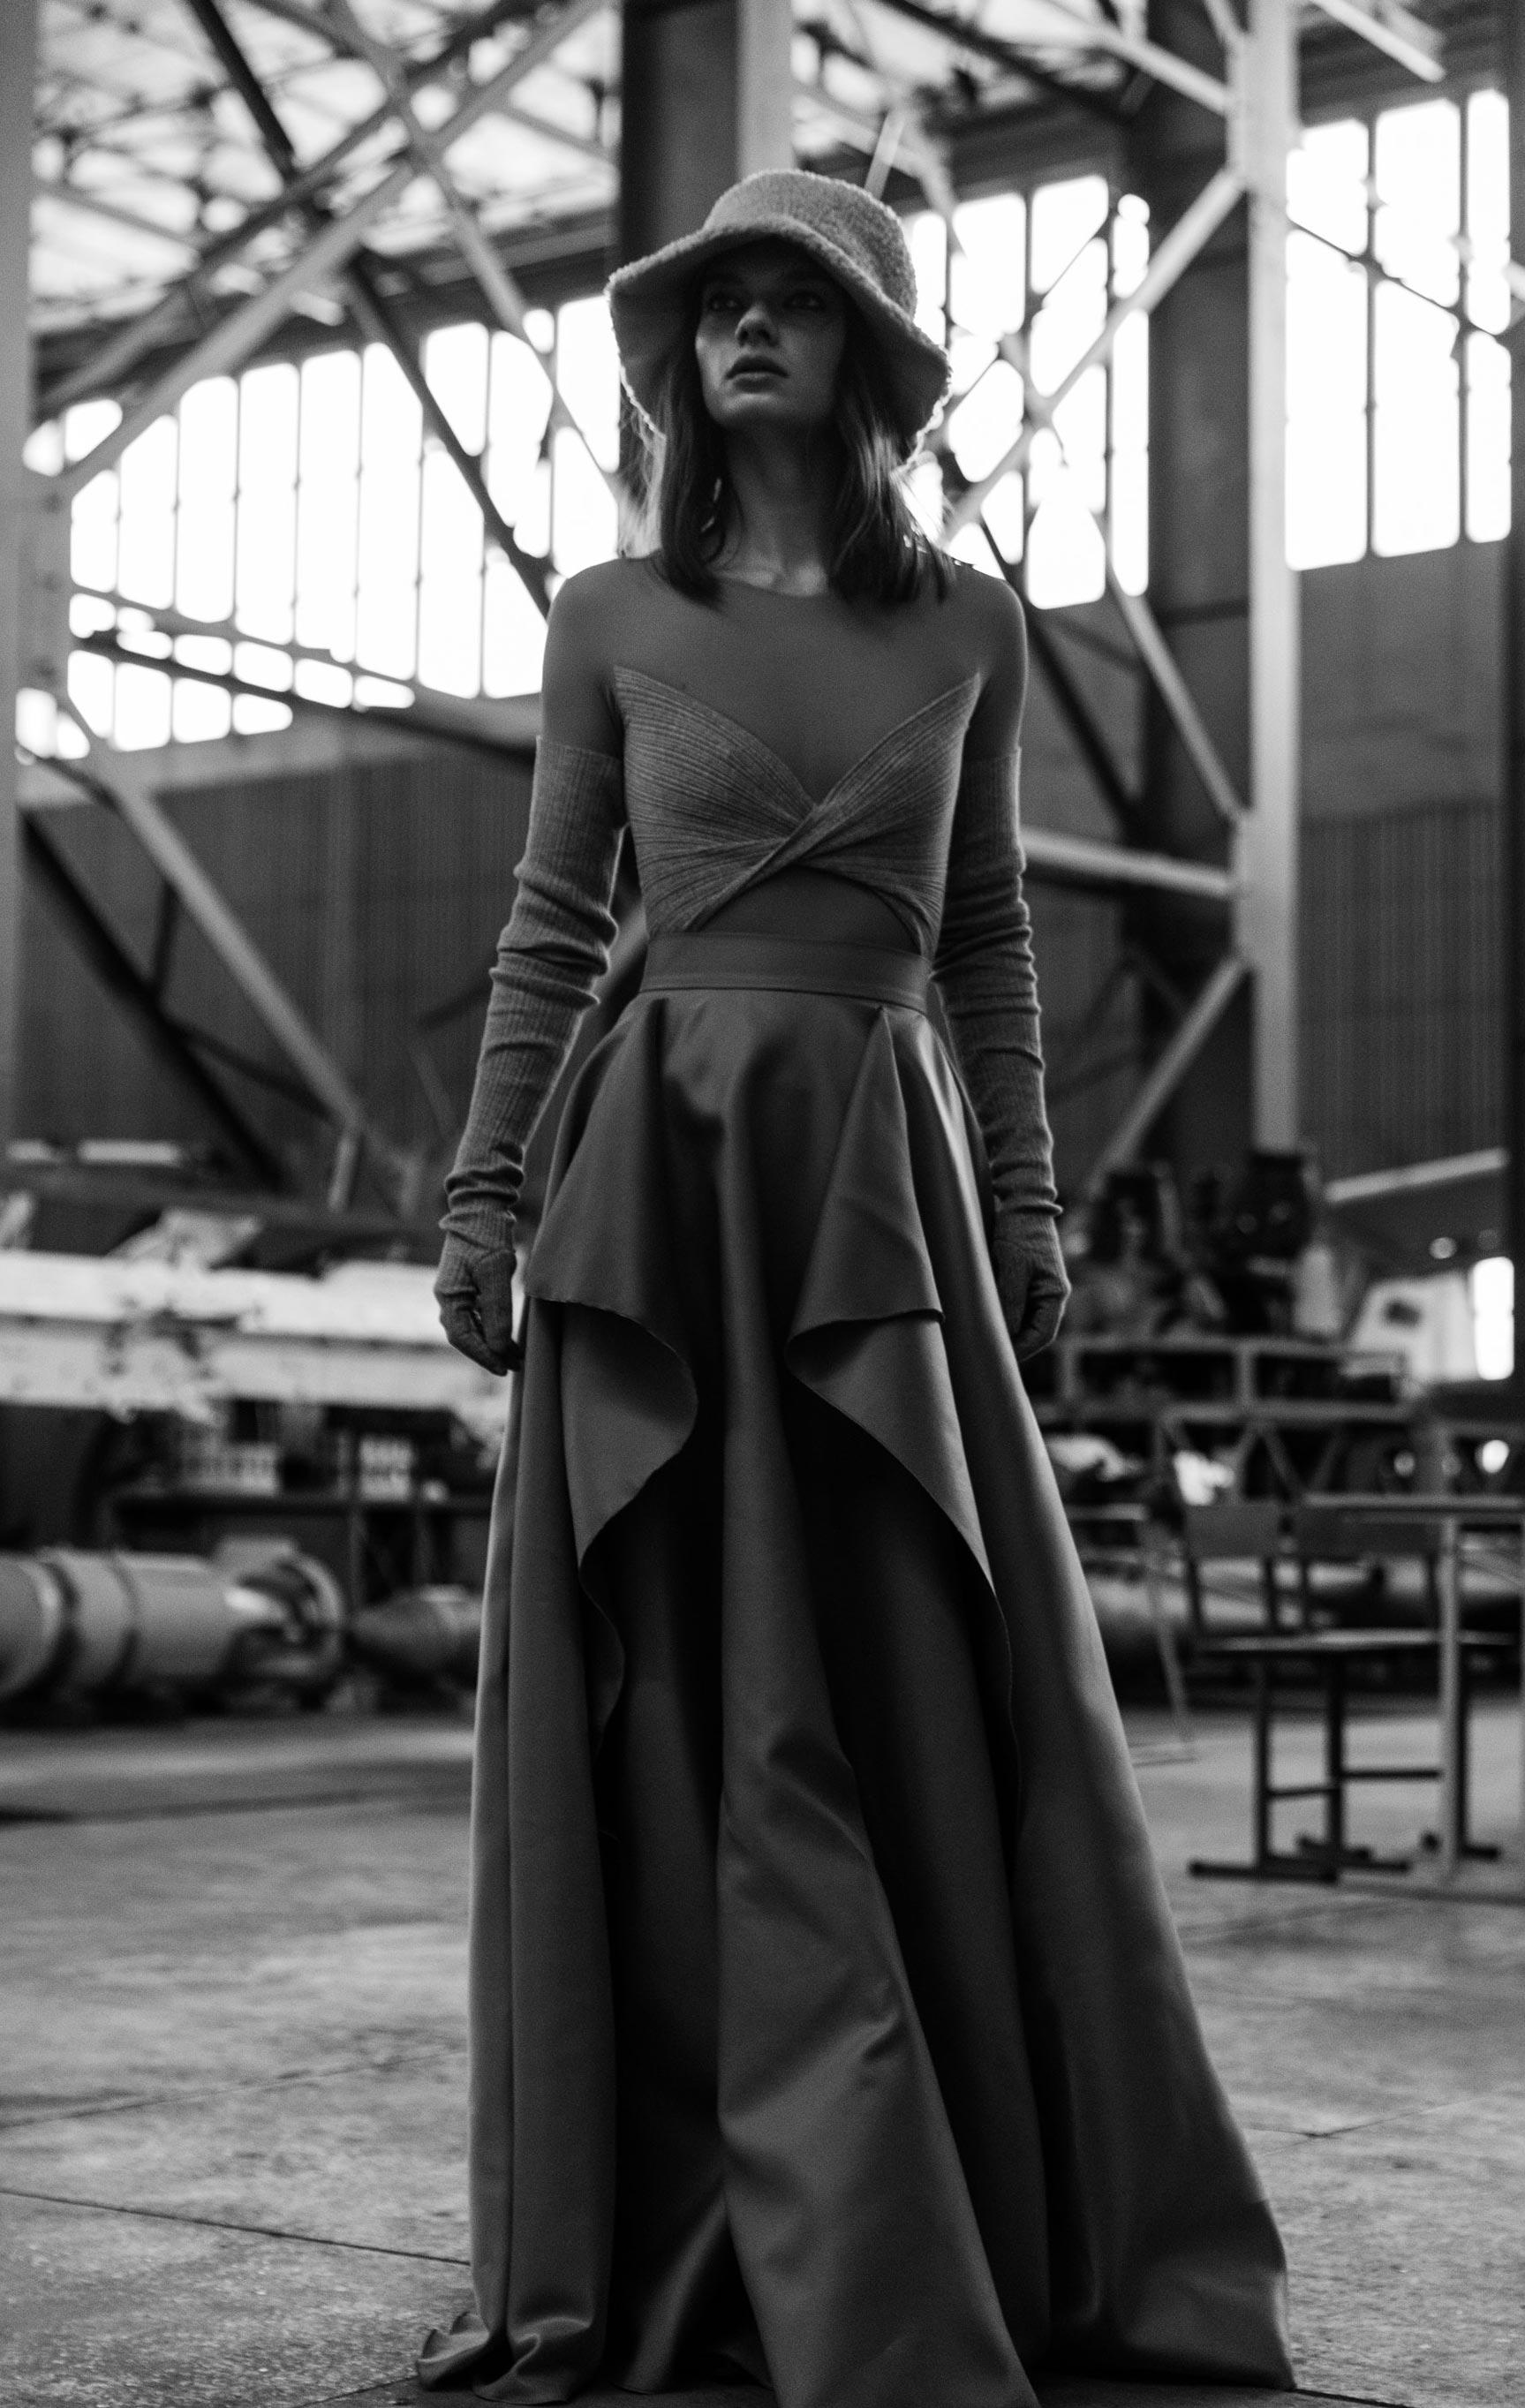 осенне-зимняя 2021-22 коллекция модного бренда Valery Kovalska / фото 05